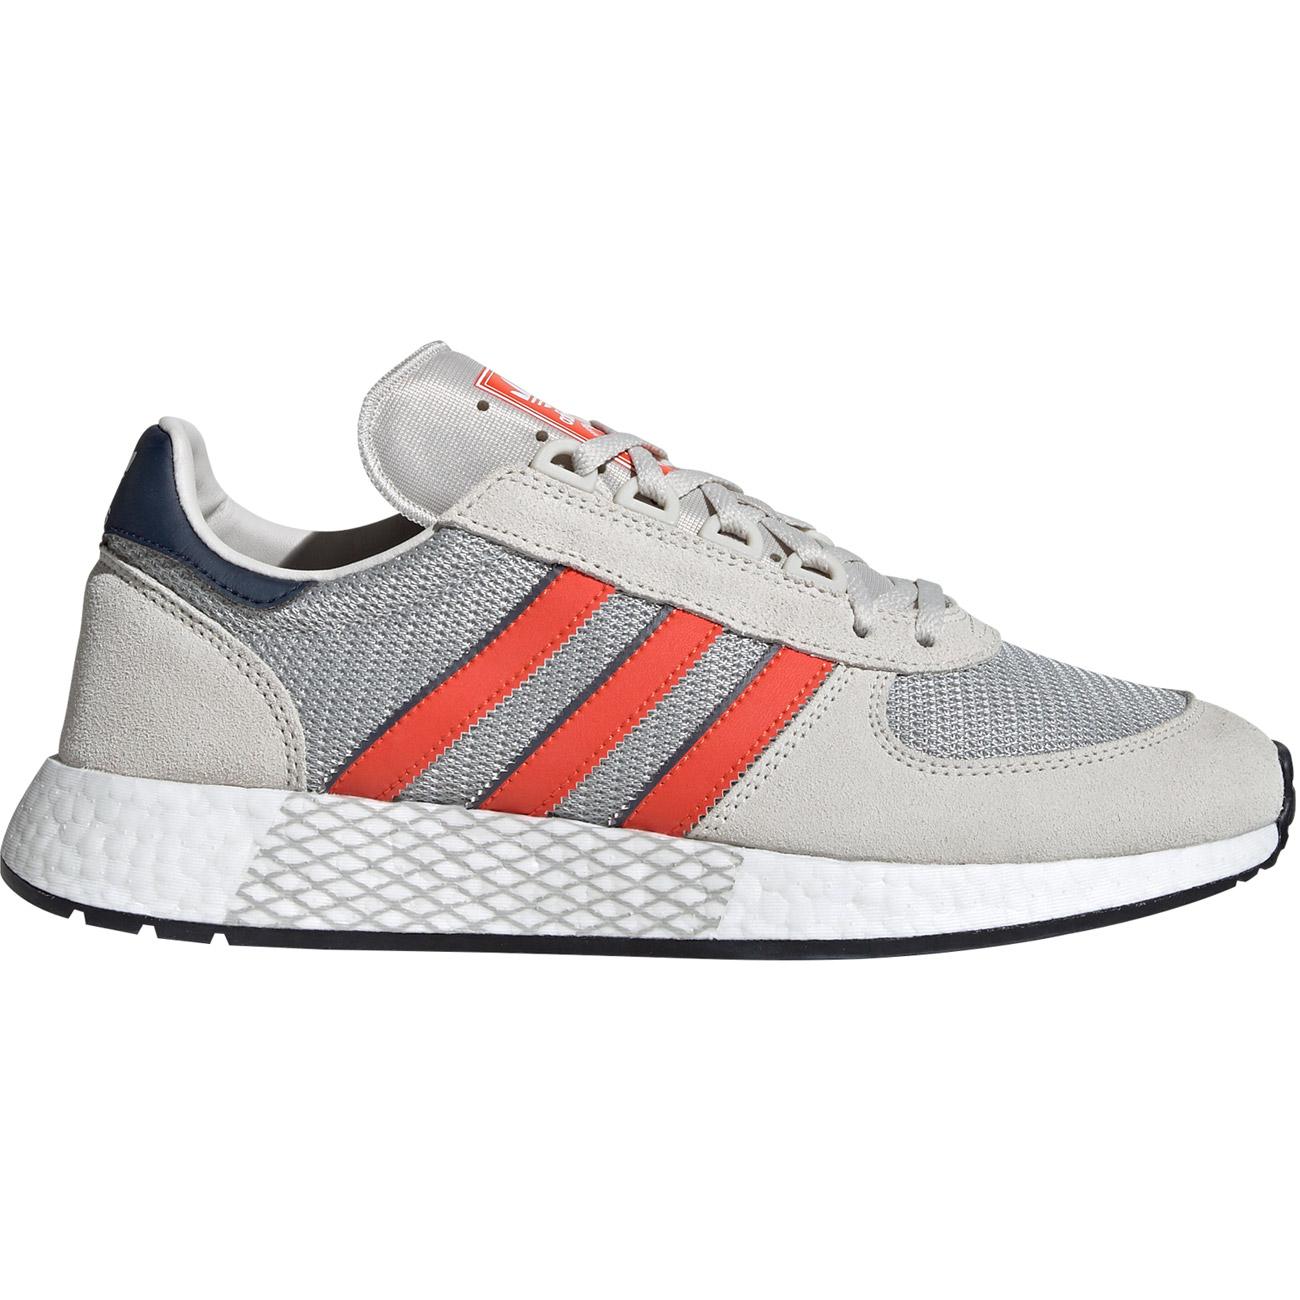 Herren TECH Adidas MARATHON Sneaker Originals yNP0Ovw8nm